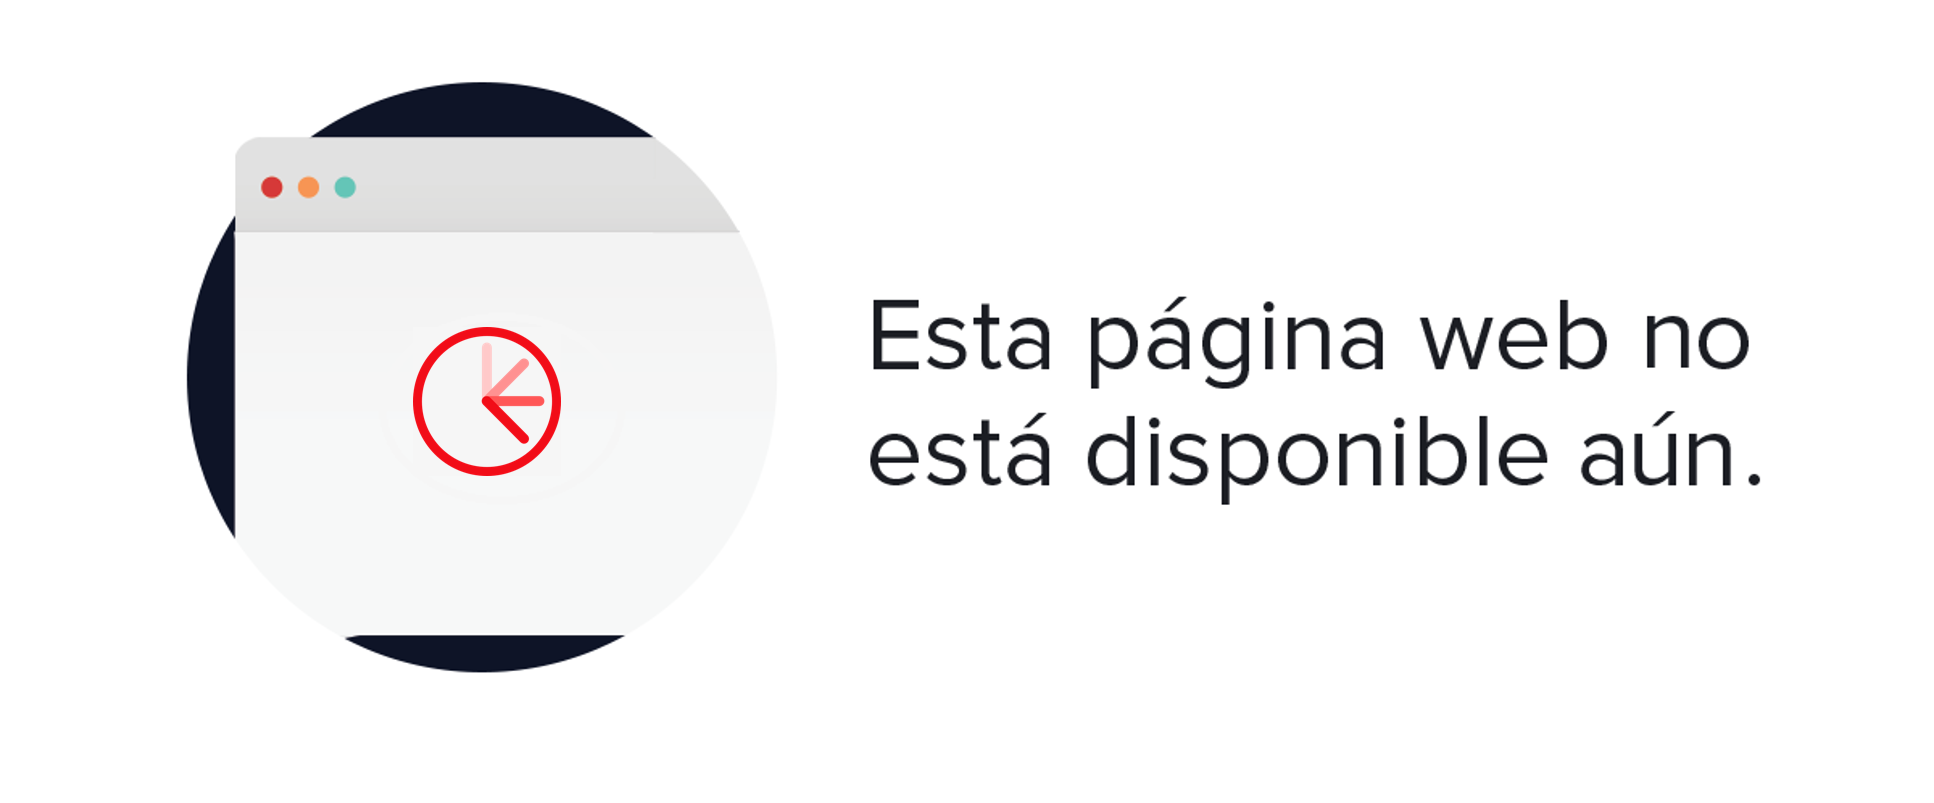 OXXO - Pantalón de Mujer OXXO 5 bolsillos de corte skinny Beige 8681613027954 - VIXMPQP